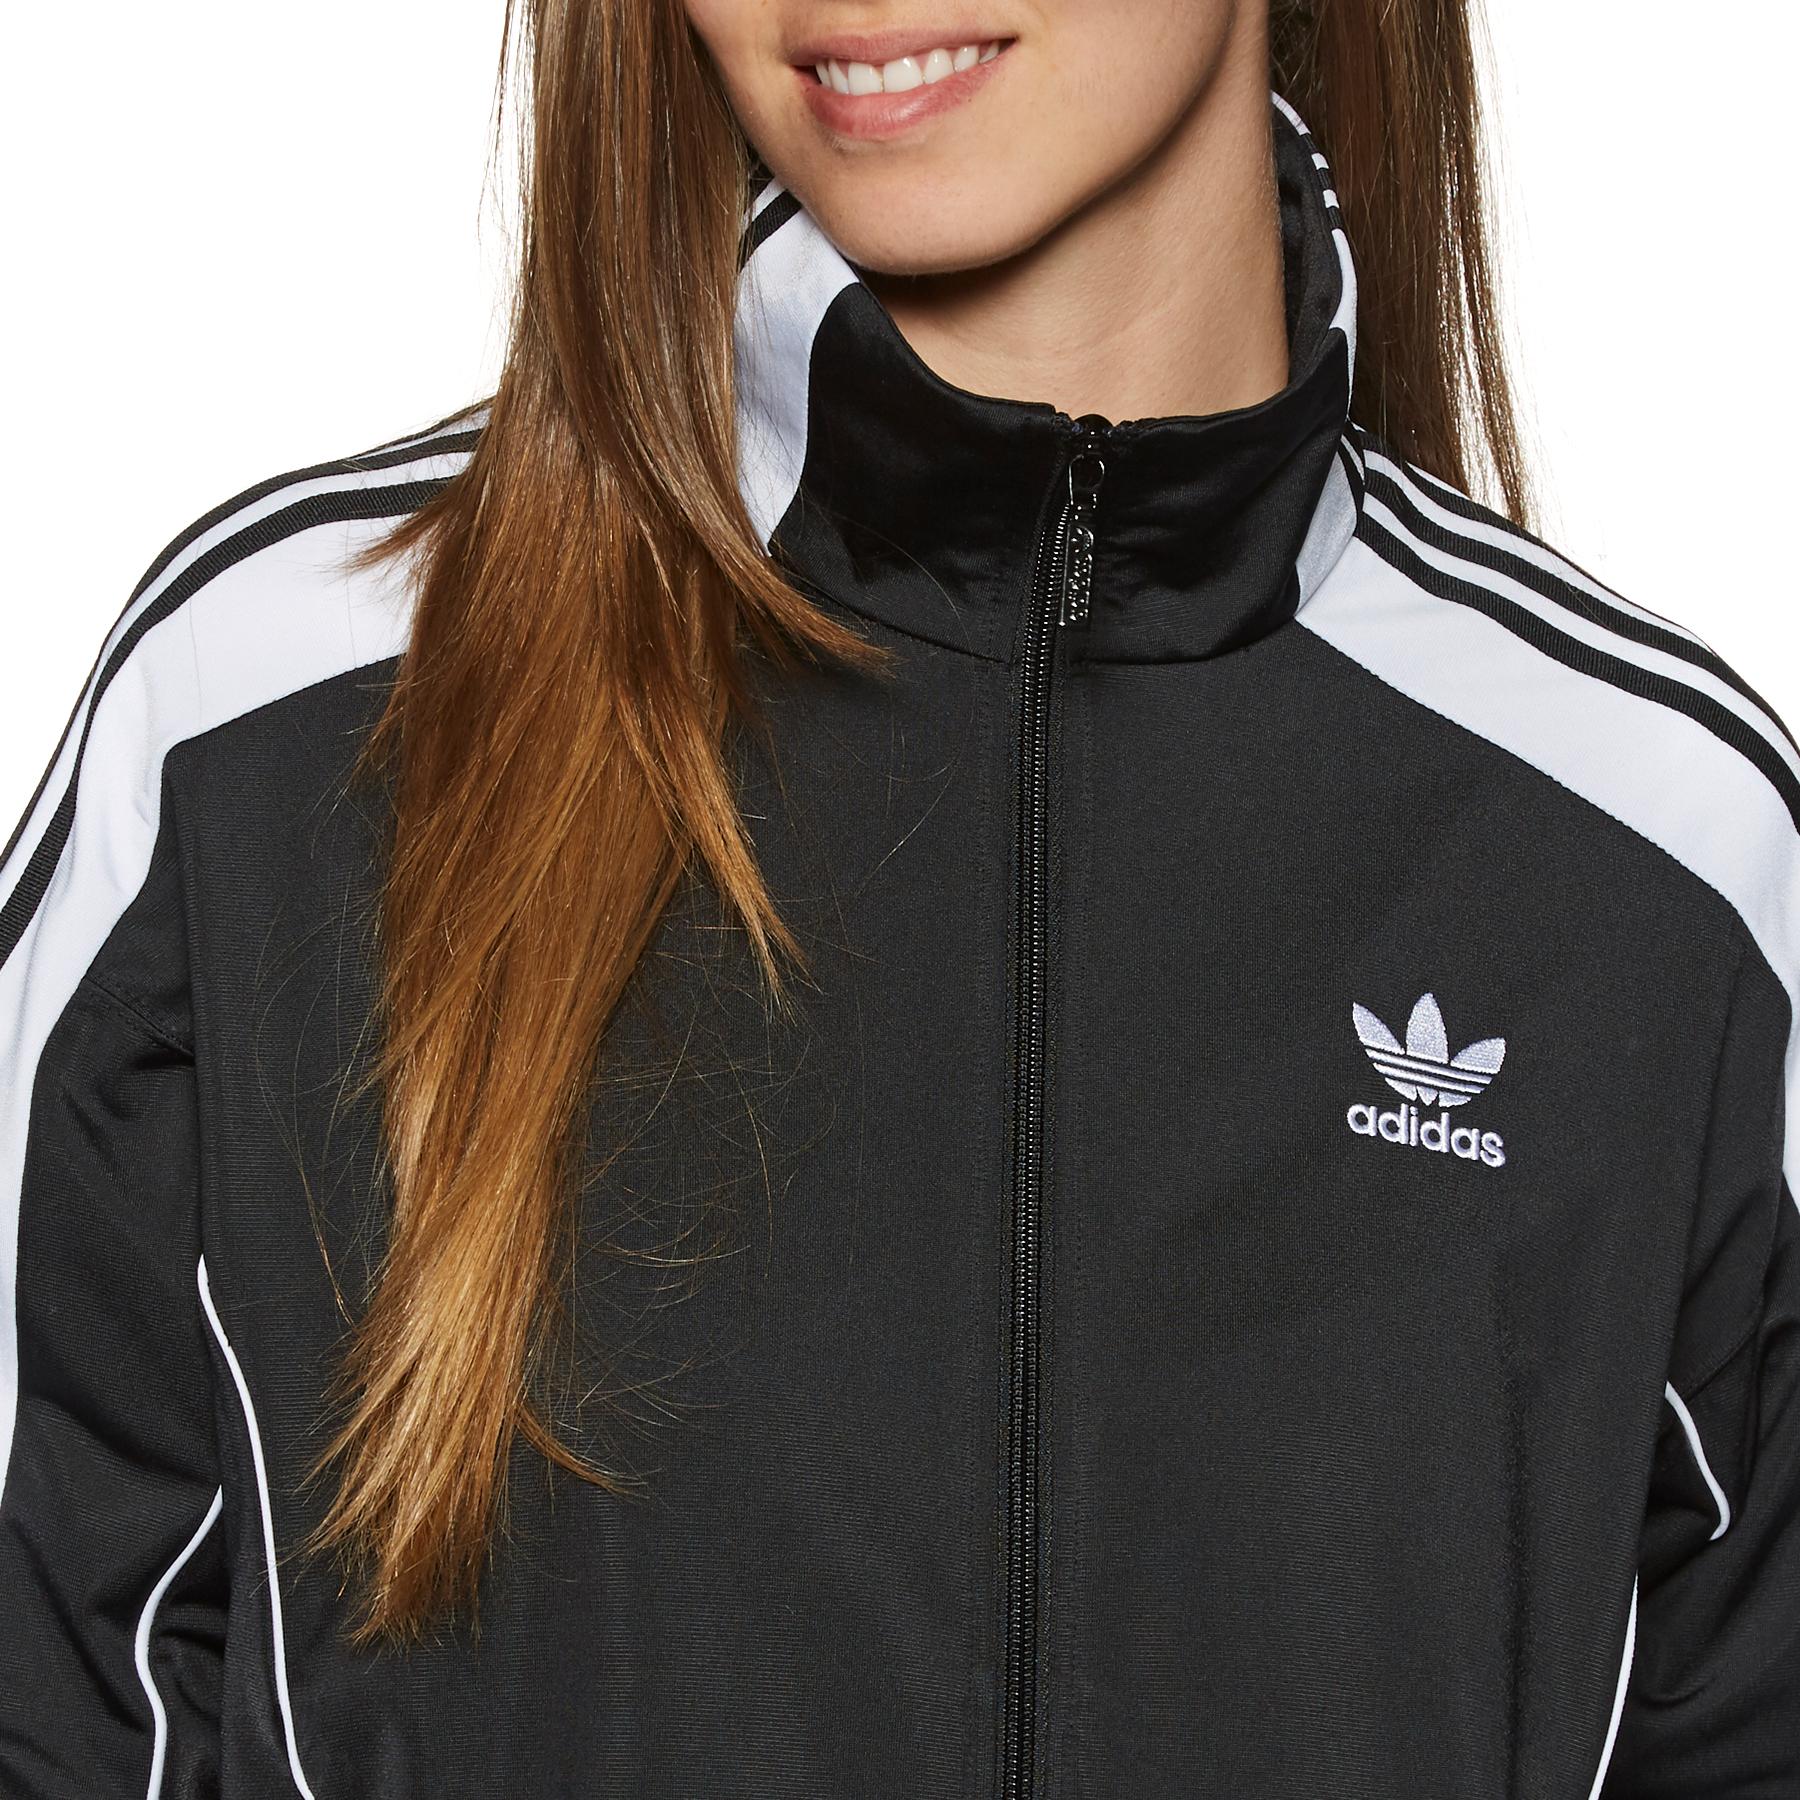 Veste pour Circuit Femme Adidas Originals Tracktop